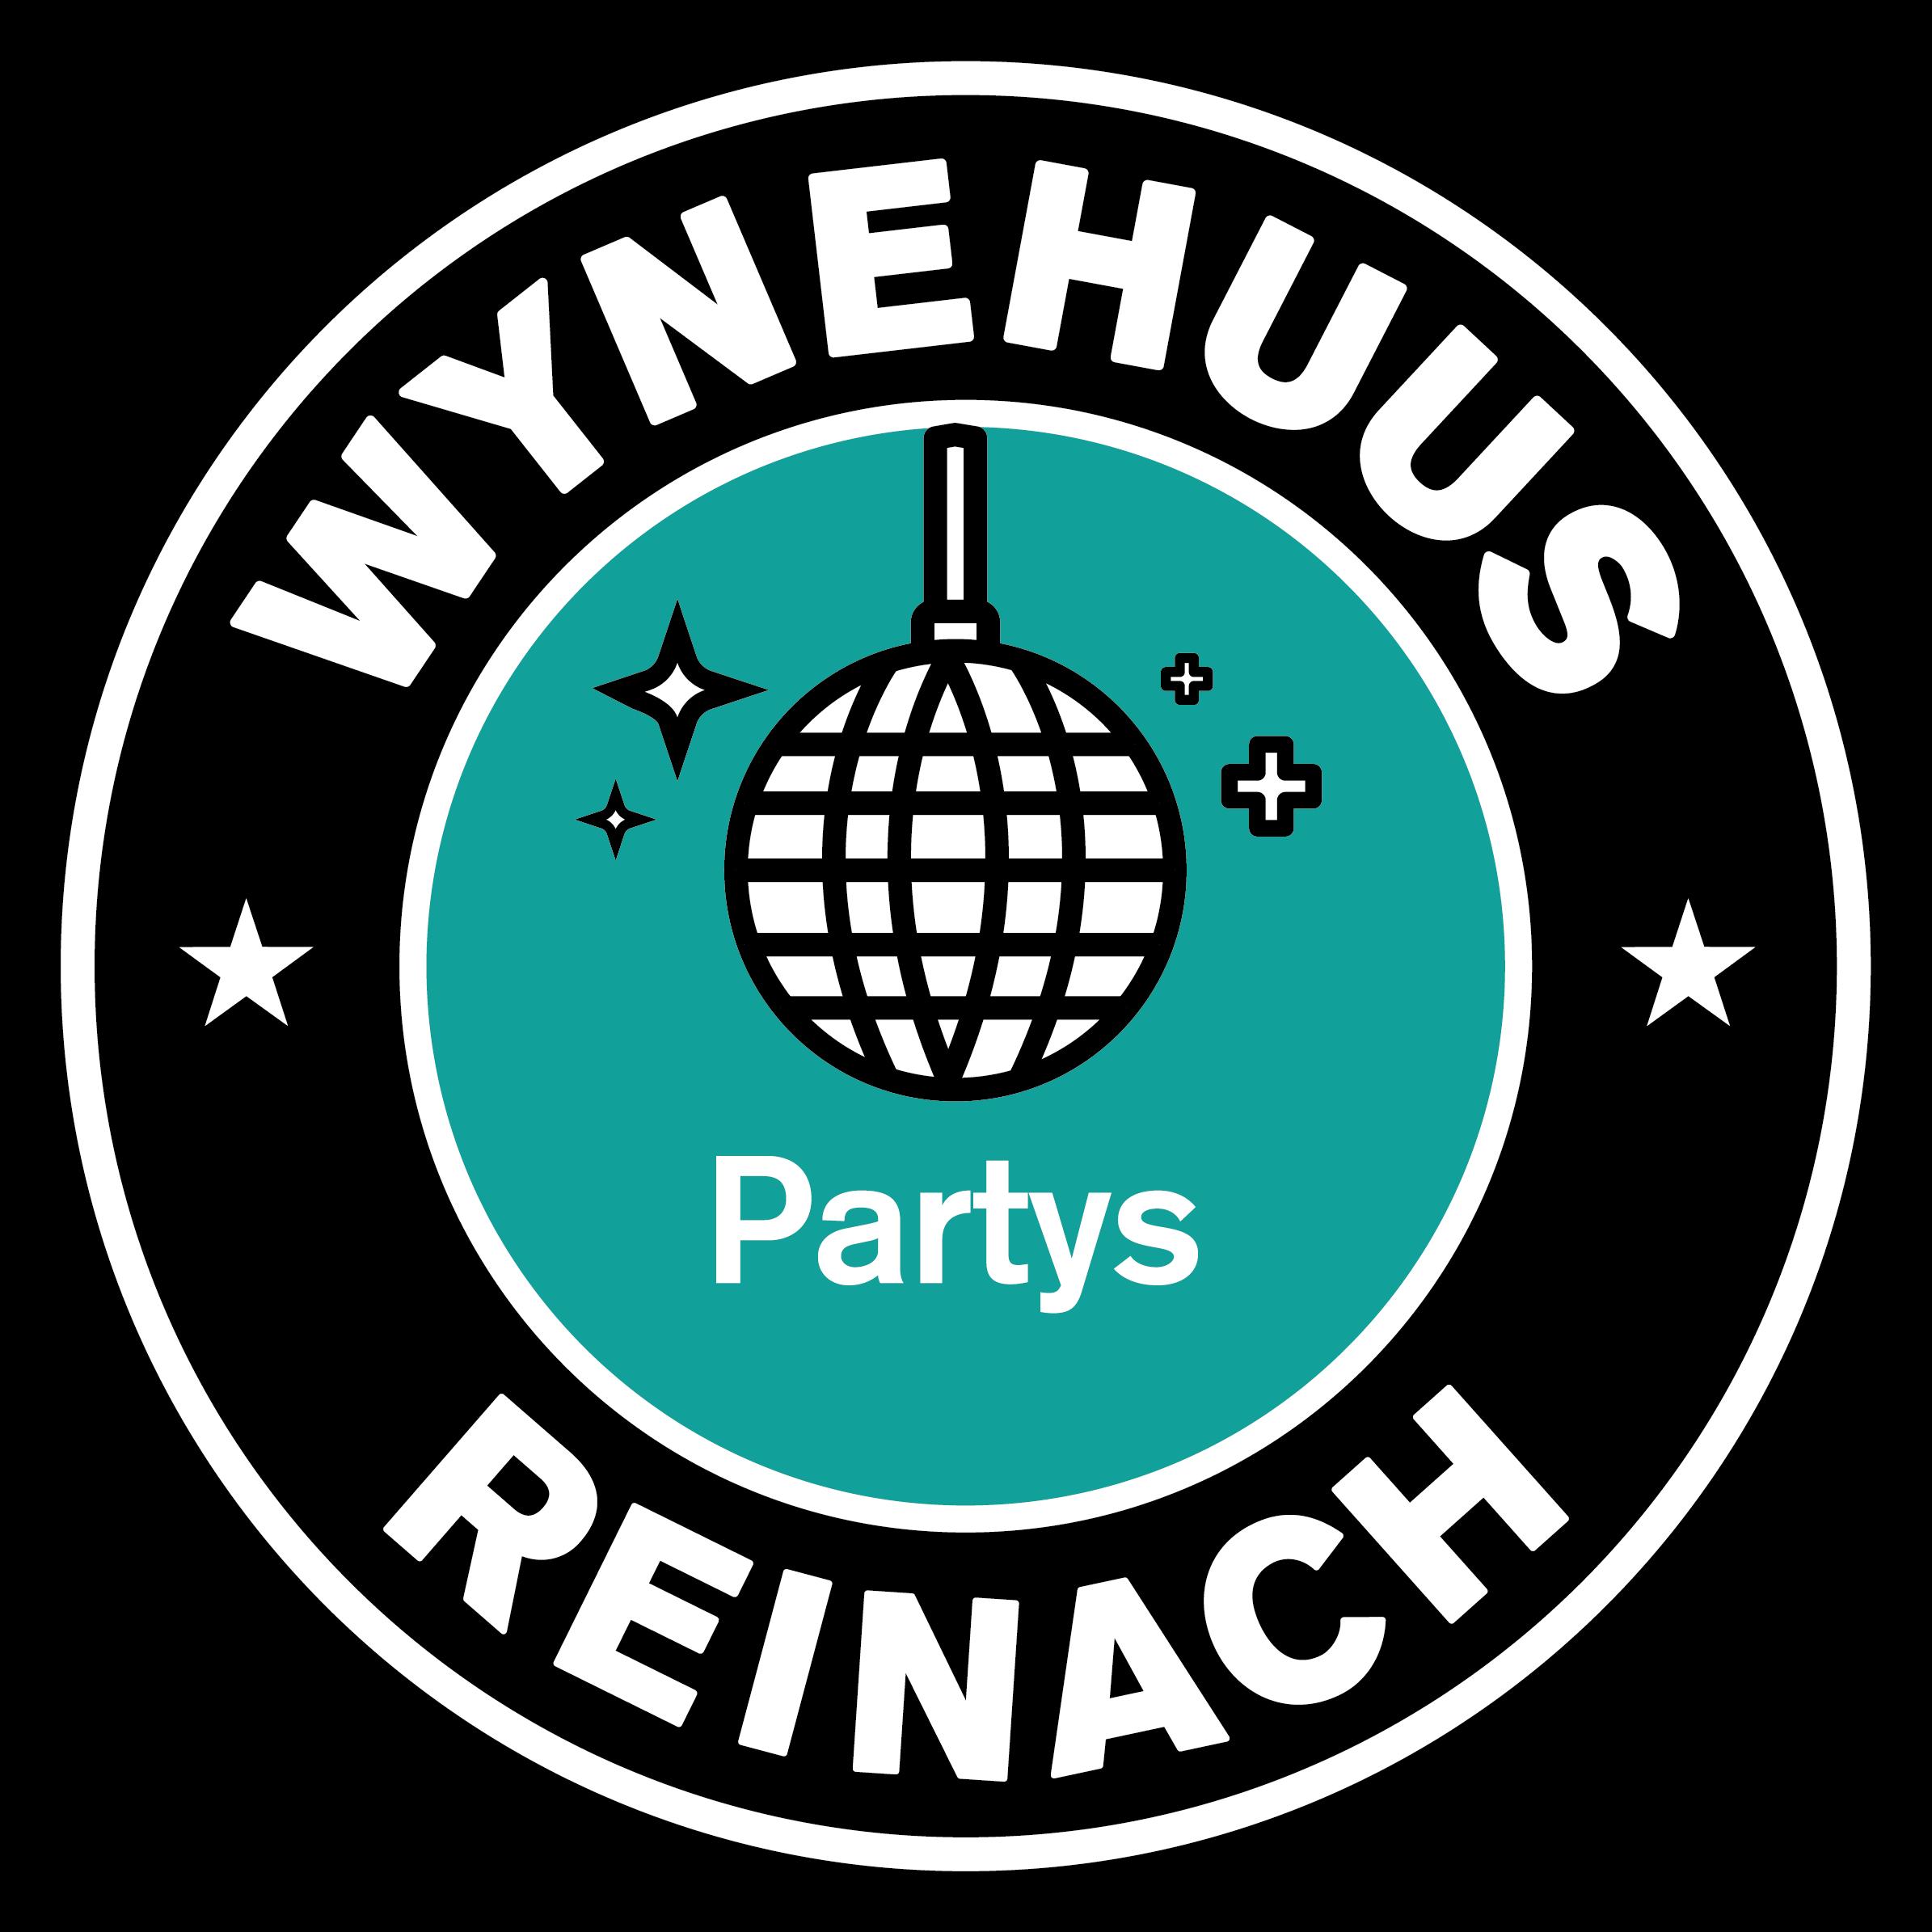 Wynehuus_Partys